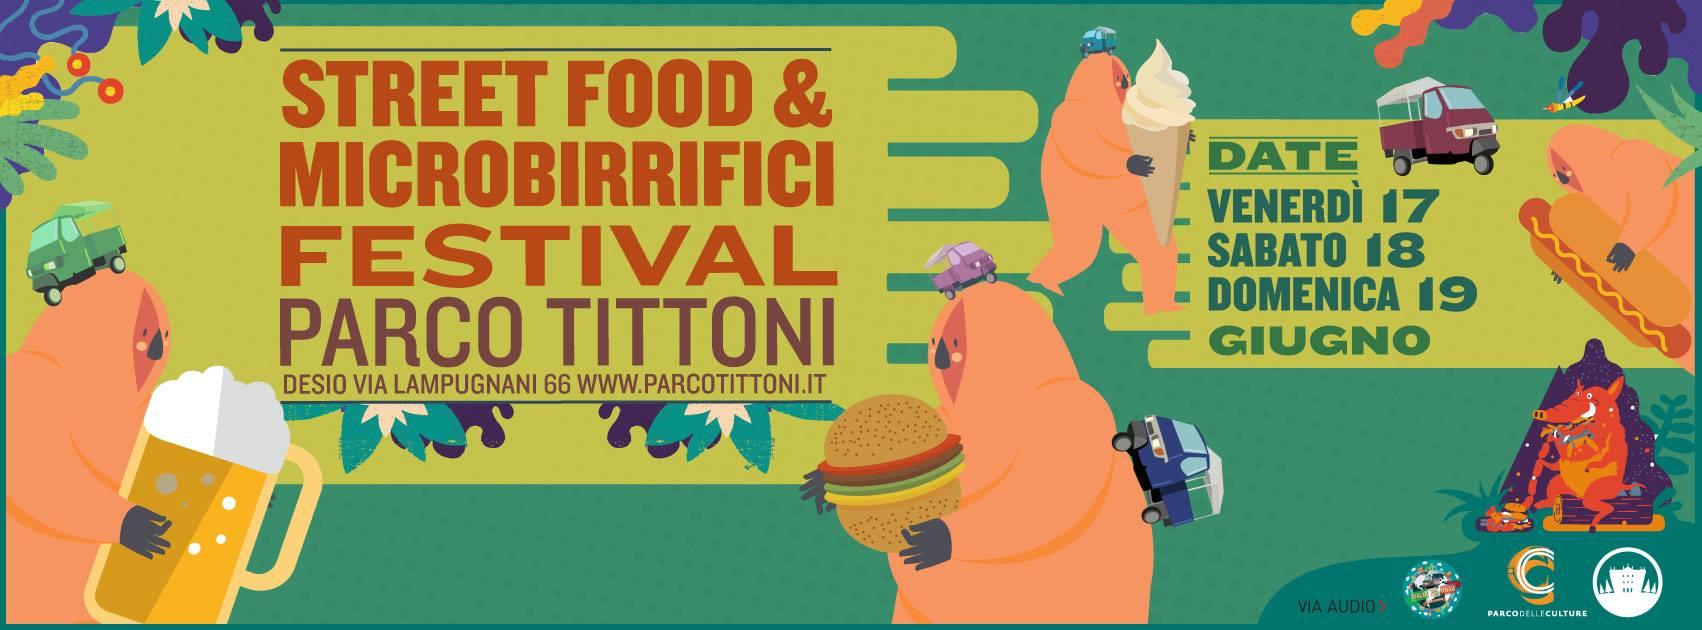 Street Food - Parco Tittoni